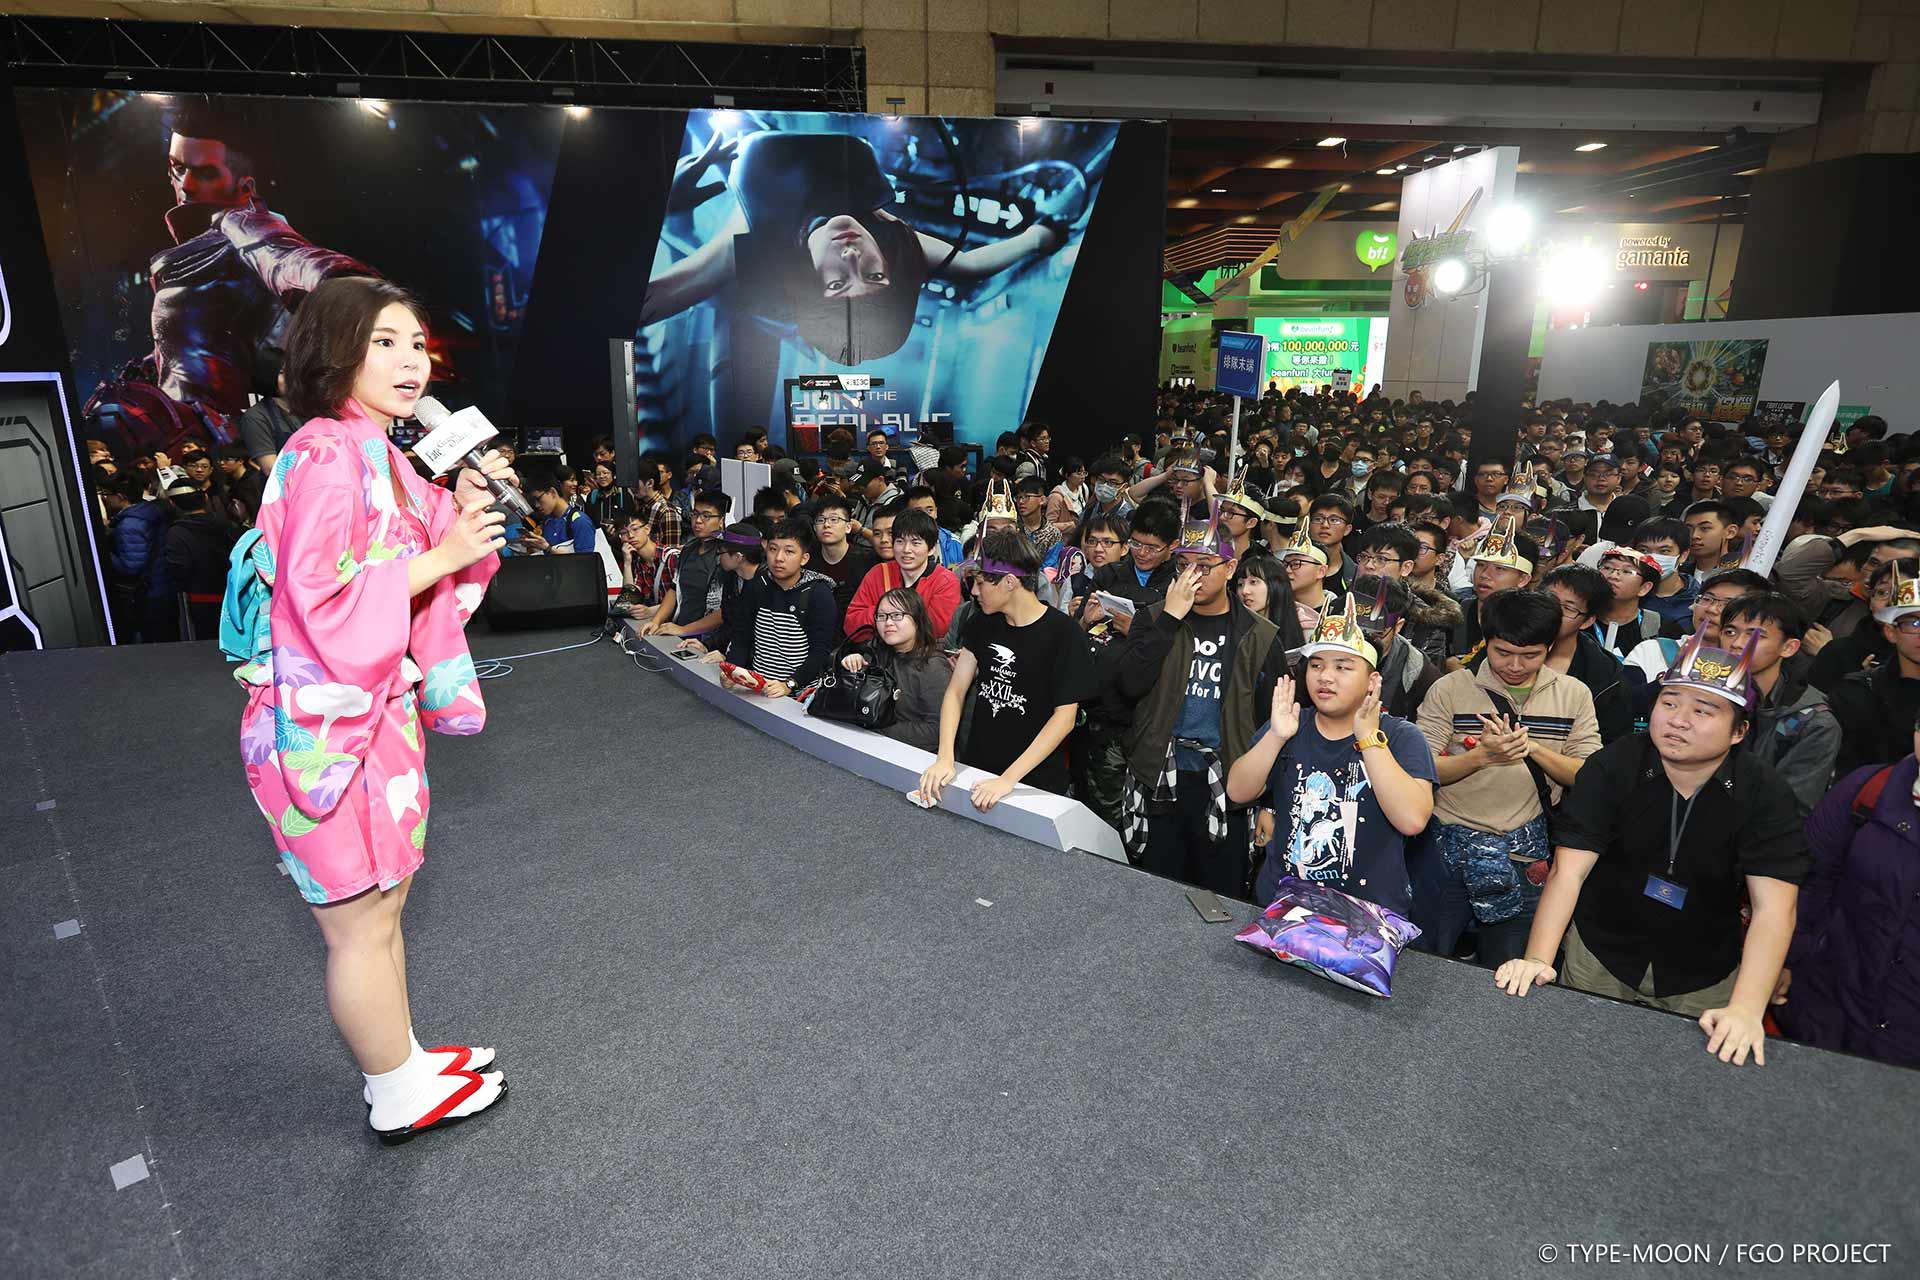 《Fate/Grand Order》2019激戰TGS!『天魔御伽草子.鬼島降臨』開幕首日!人氣爆棚、互動不間斷!